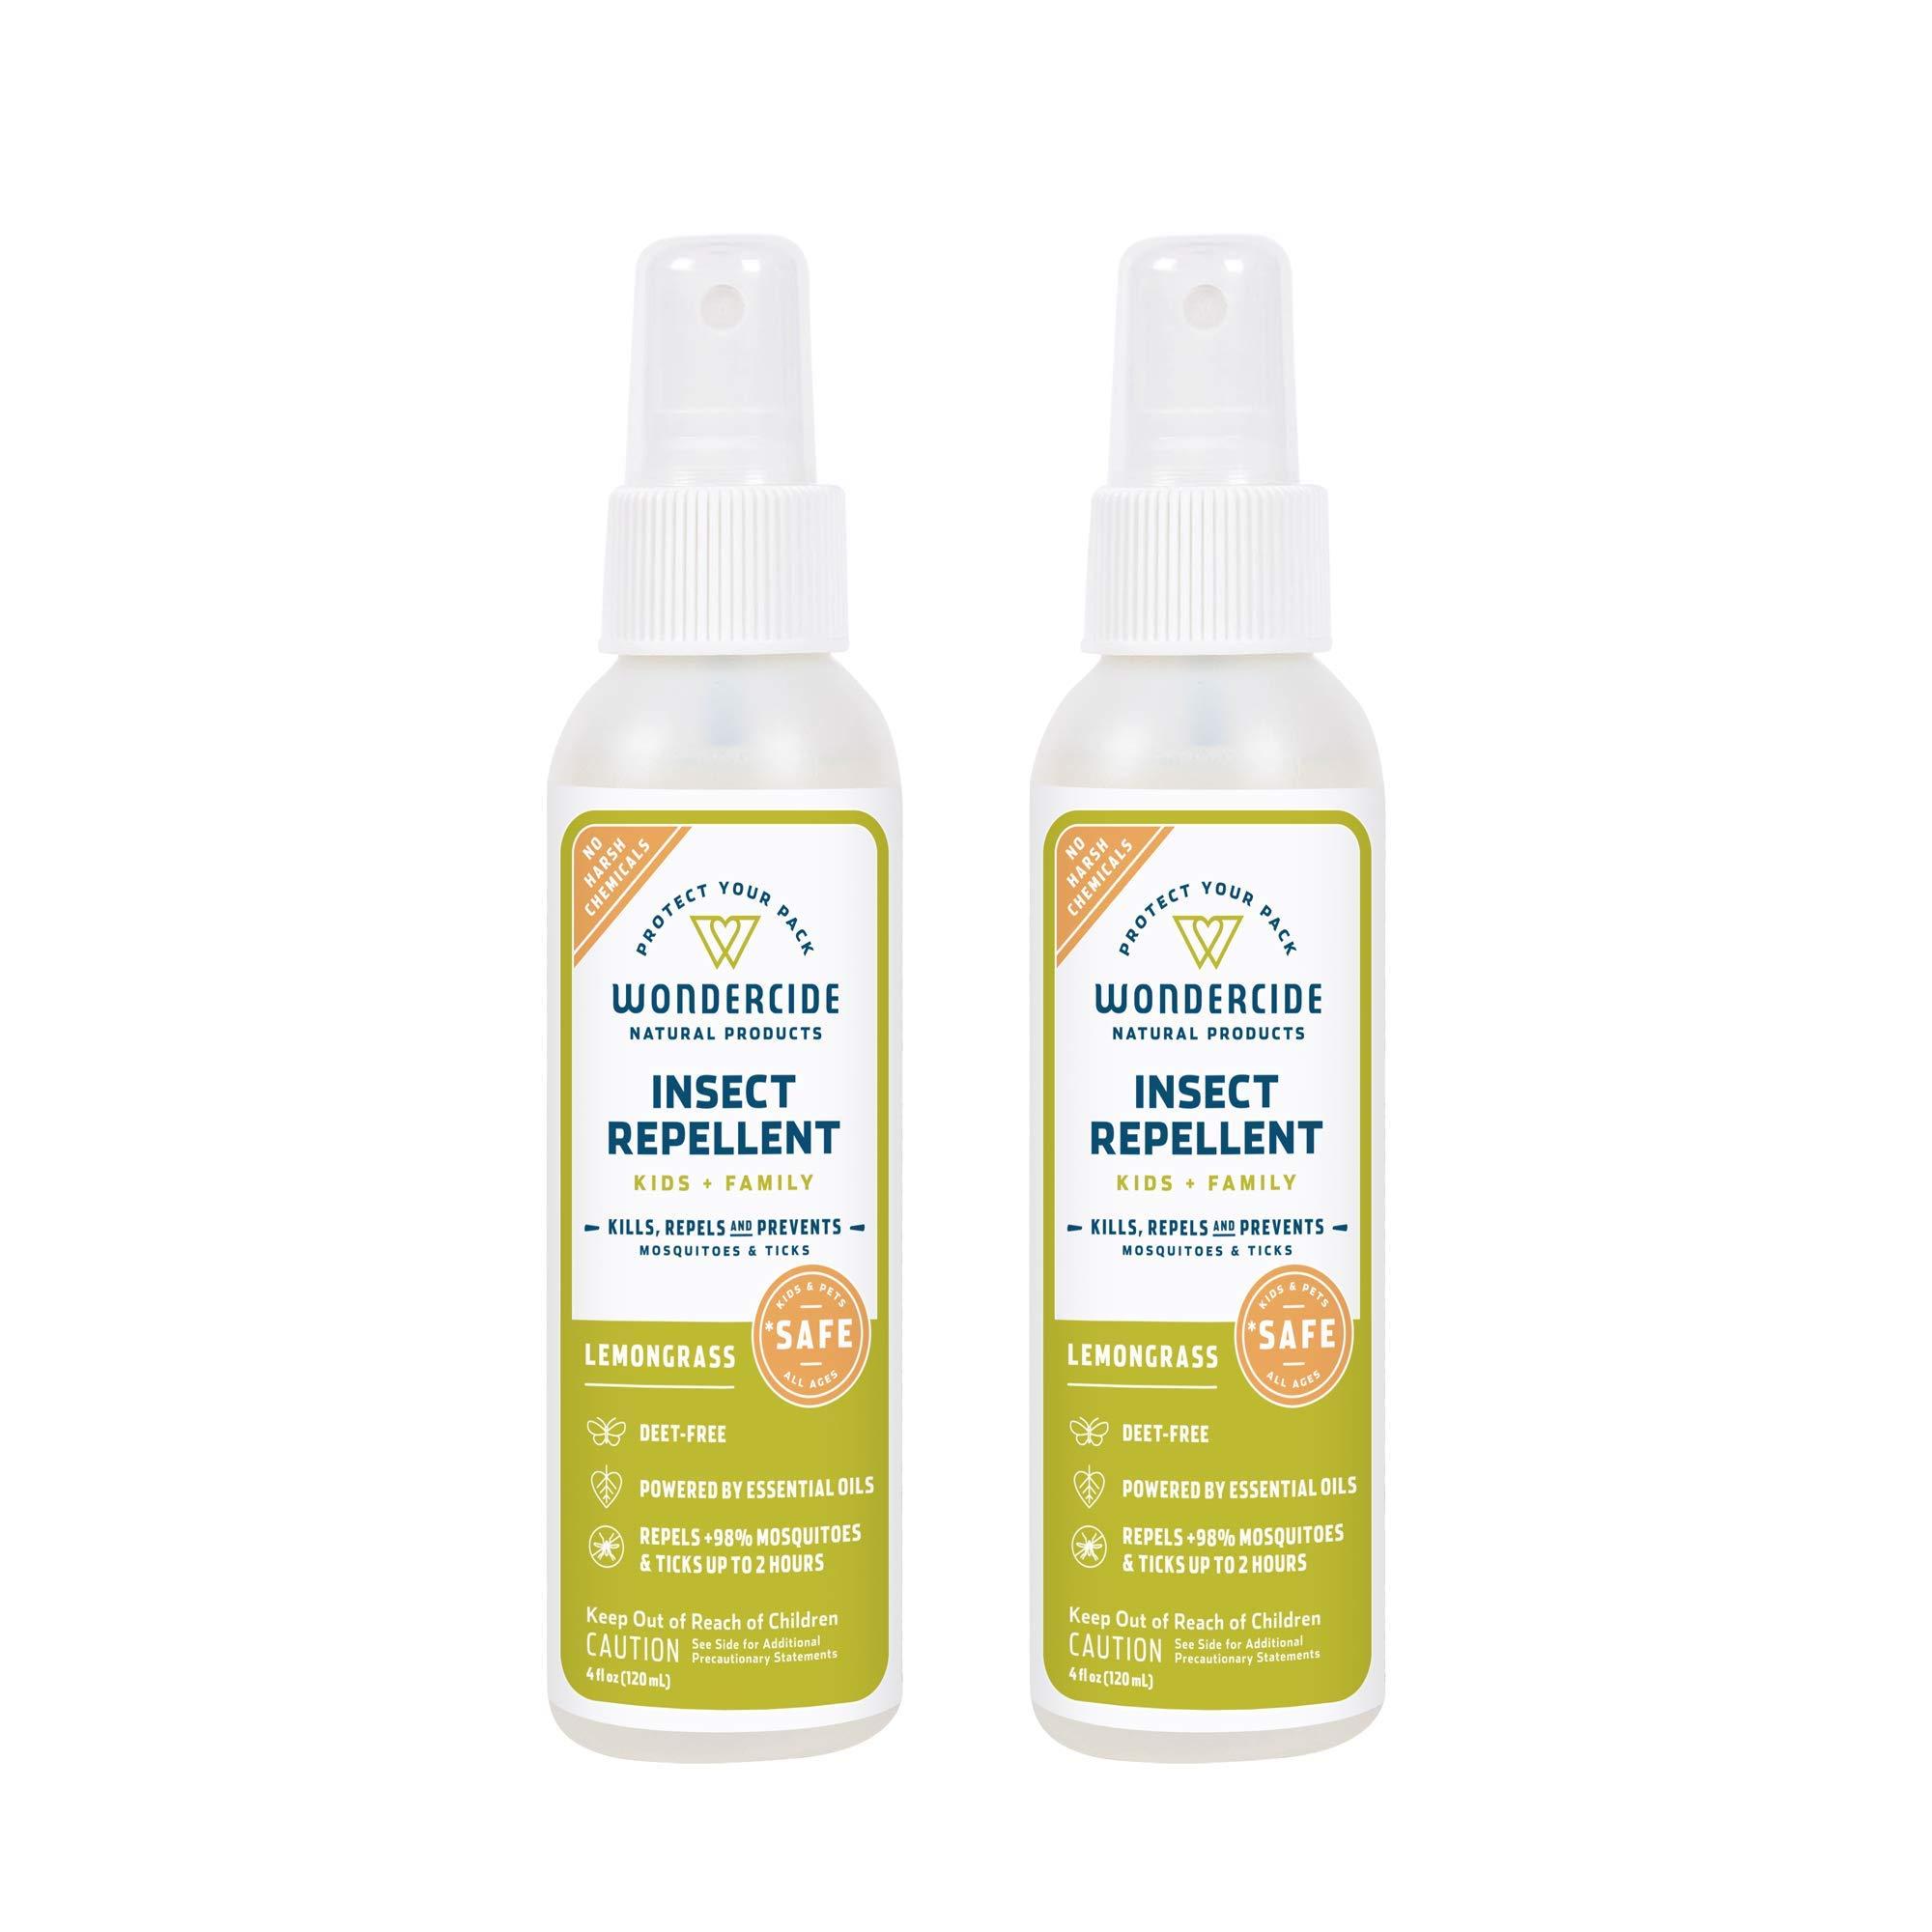 Wondercide Natural Deet Free Insect Repellent 4 oz Pack of 2 (Lemongrass)